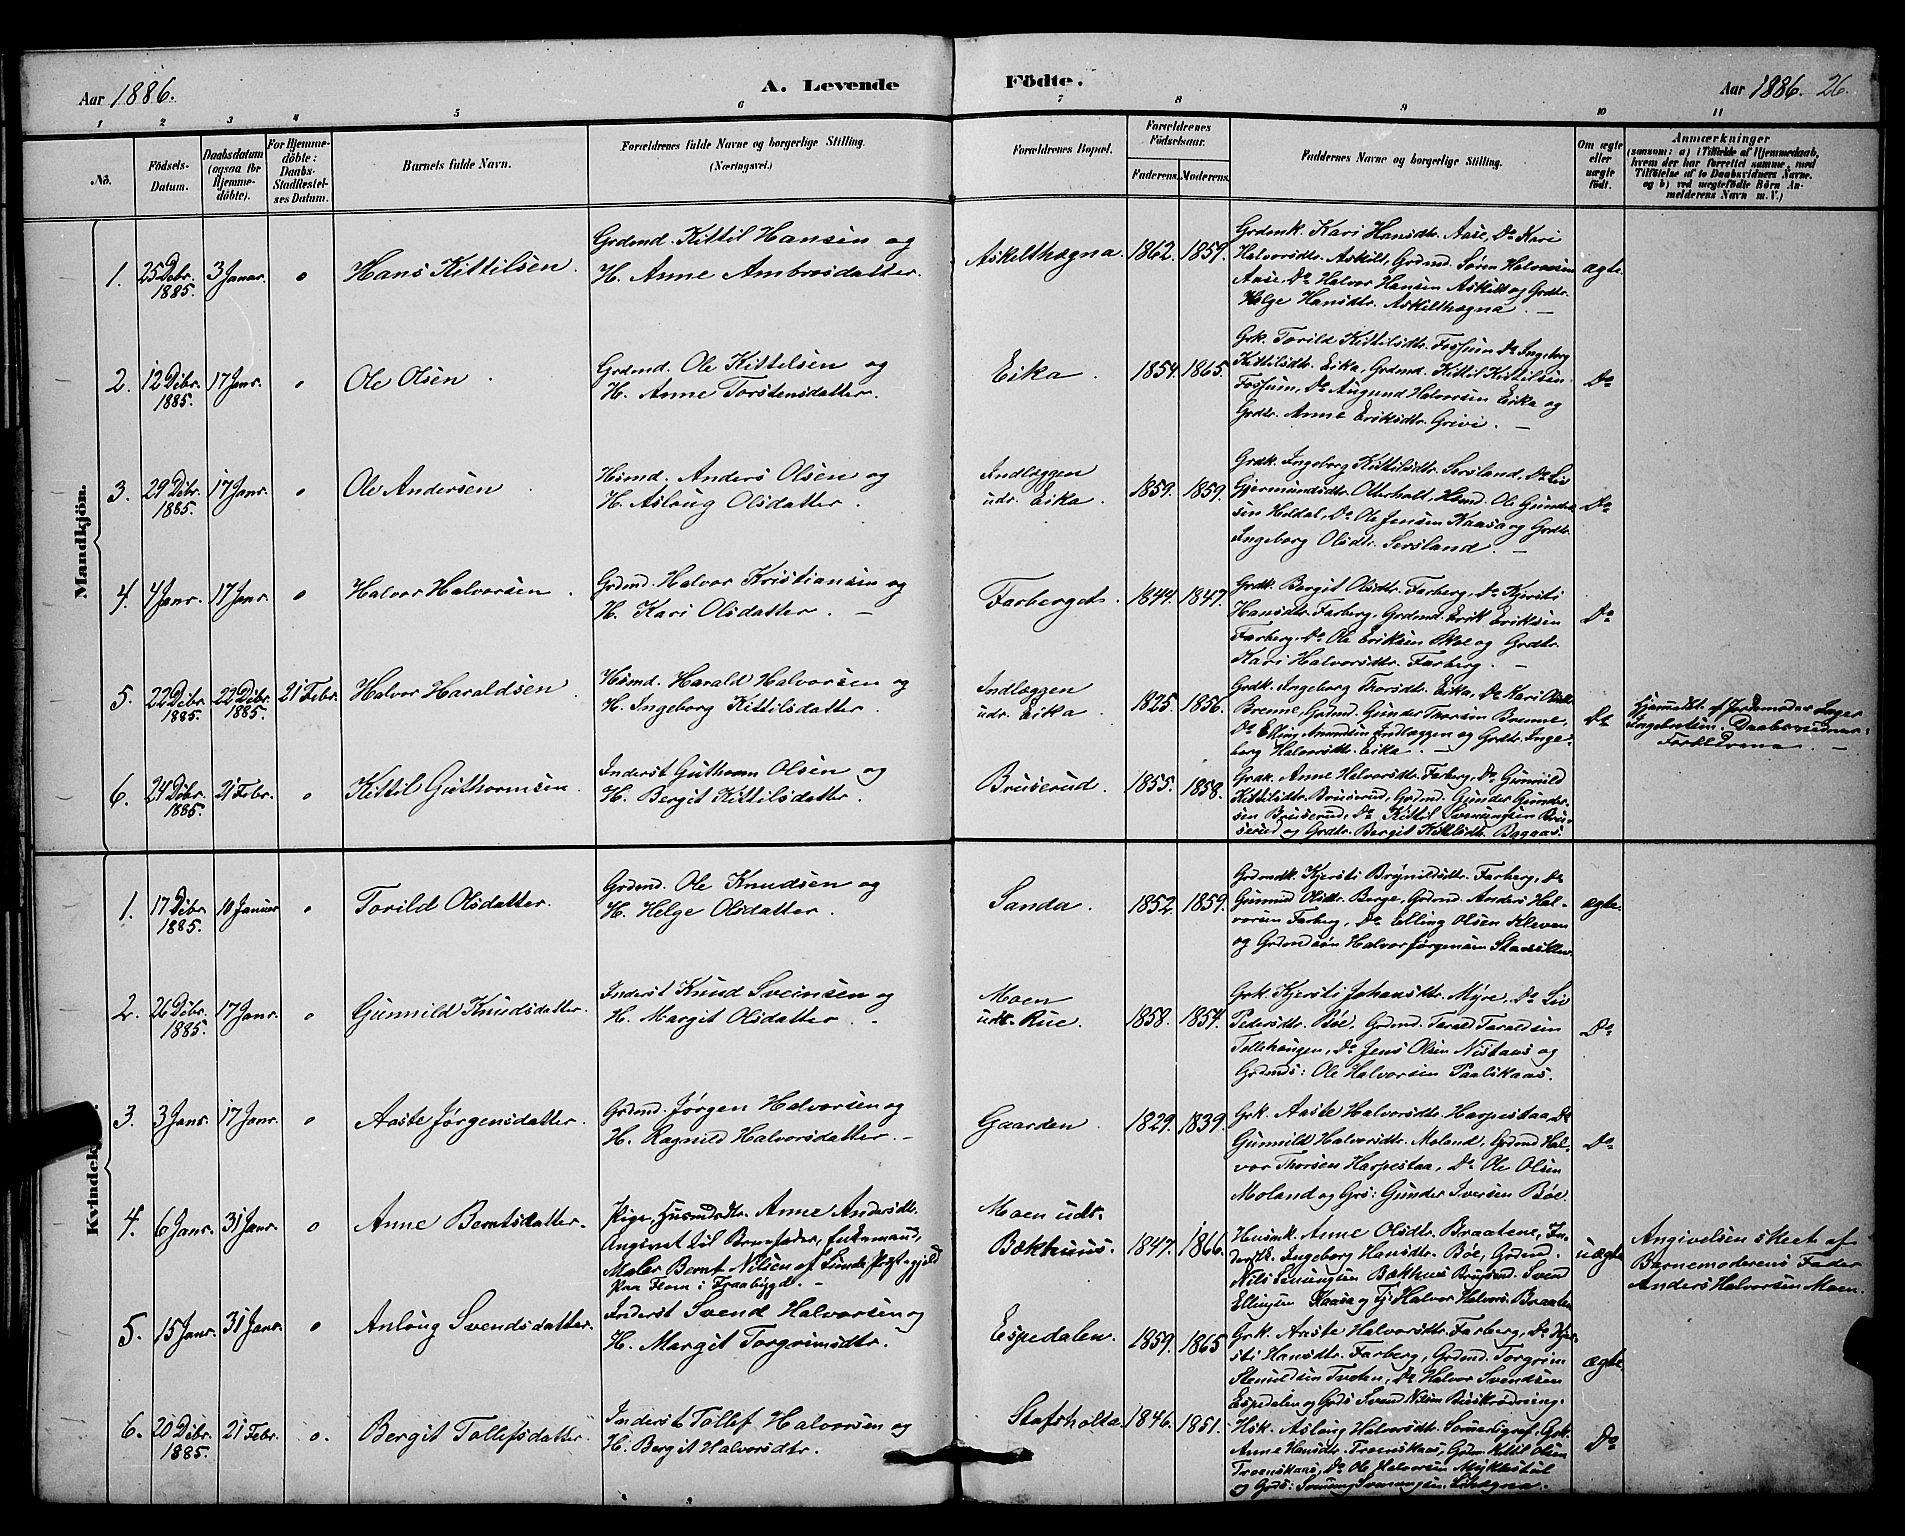 SAKO, Bø kirkebøker, G/Ga/L0005: Klokkerbok nr. 5, 1883-1897, s. 26